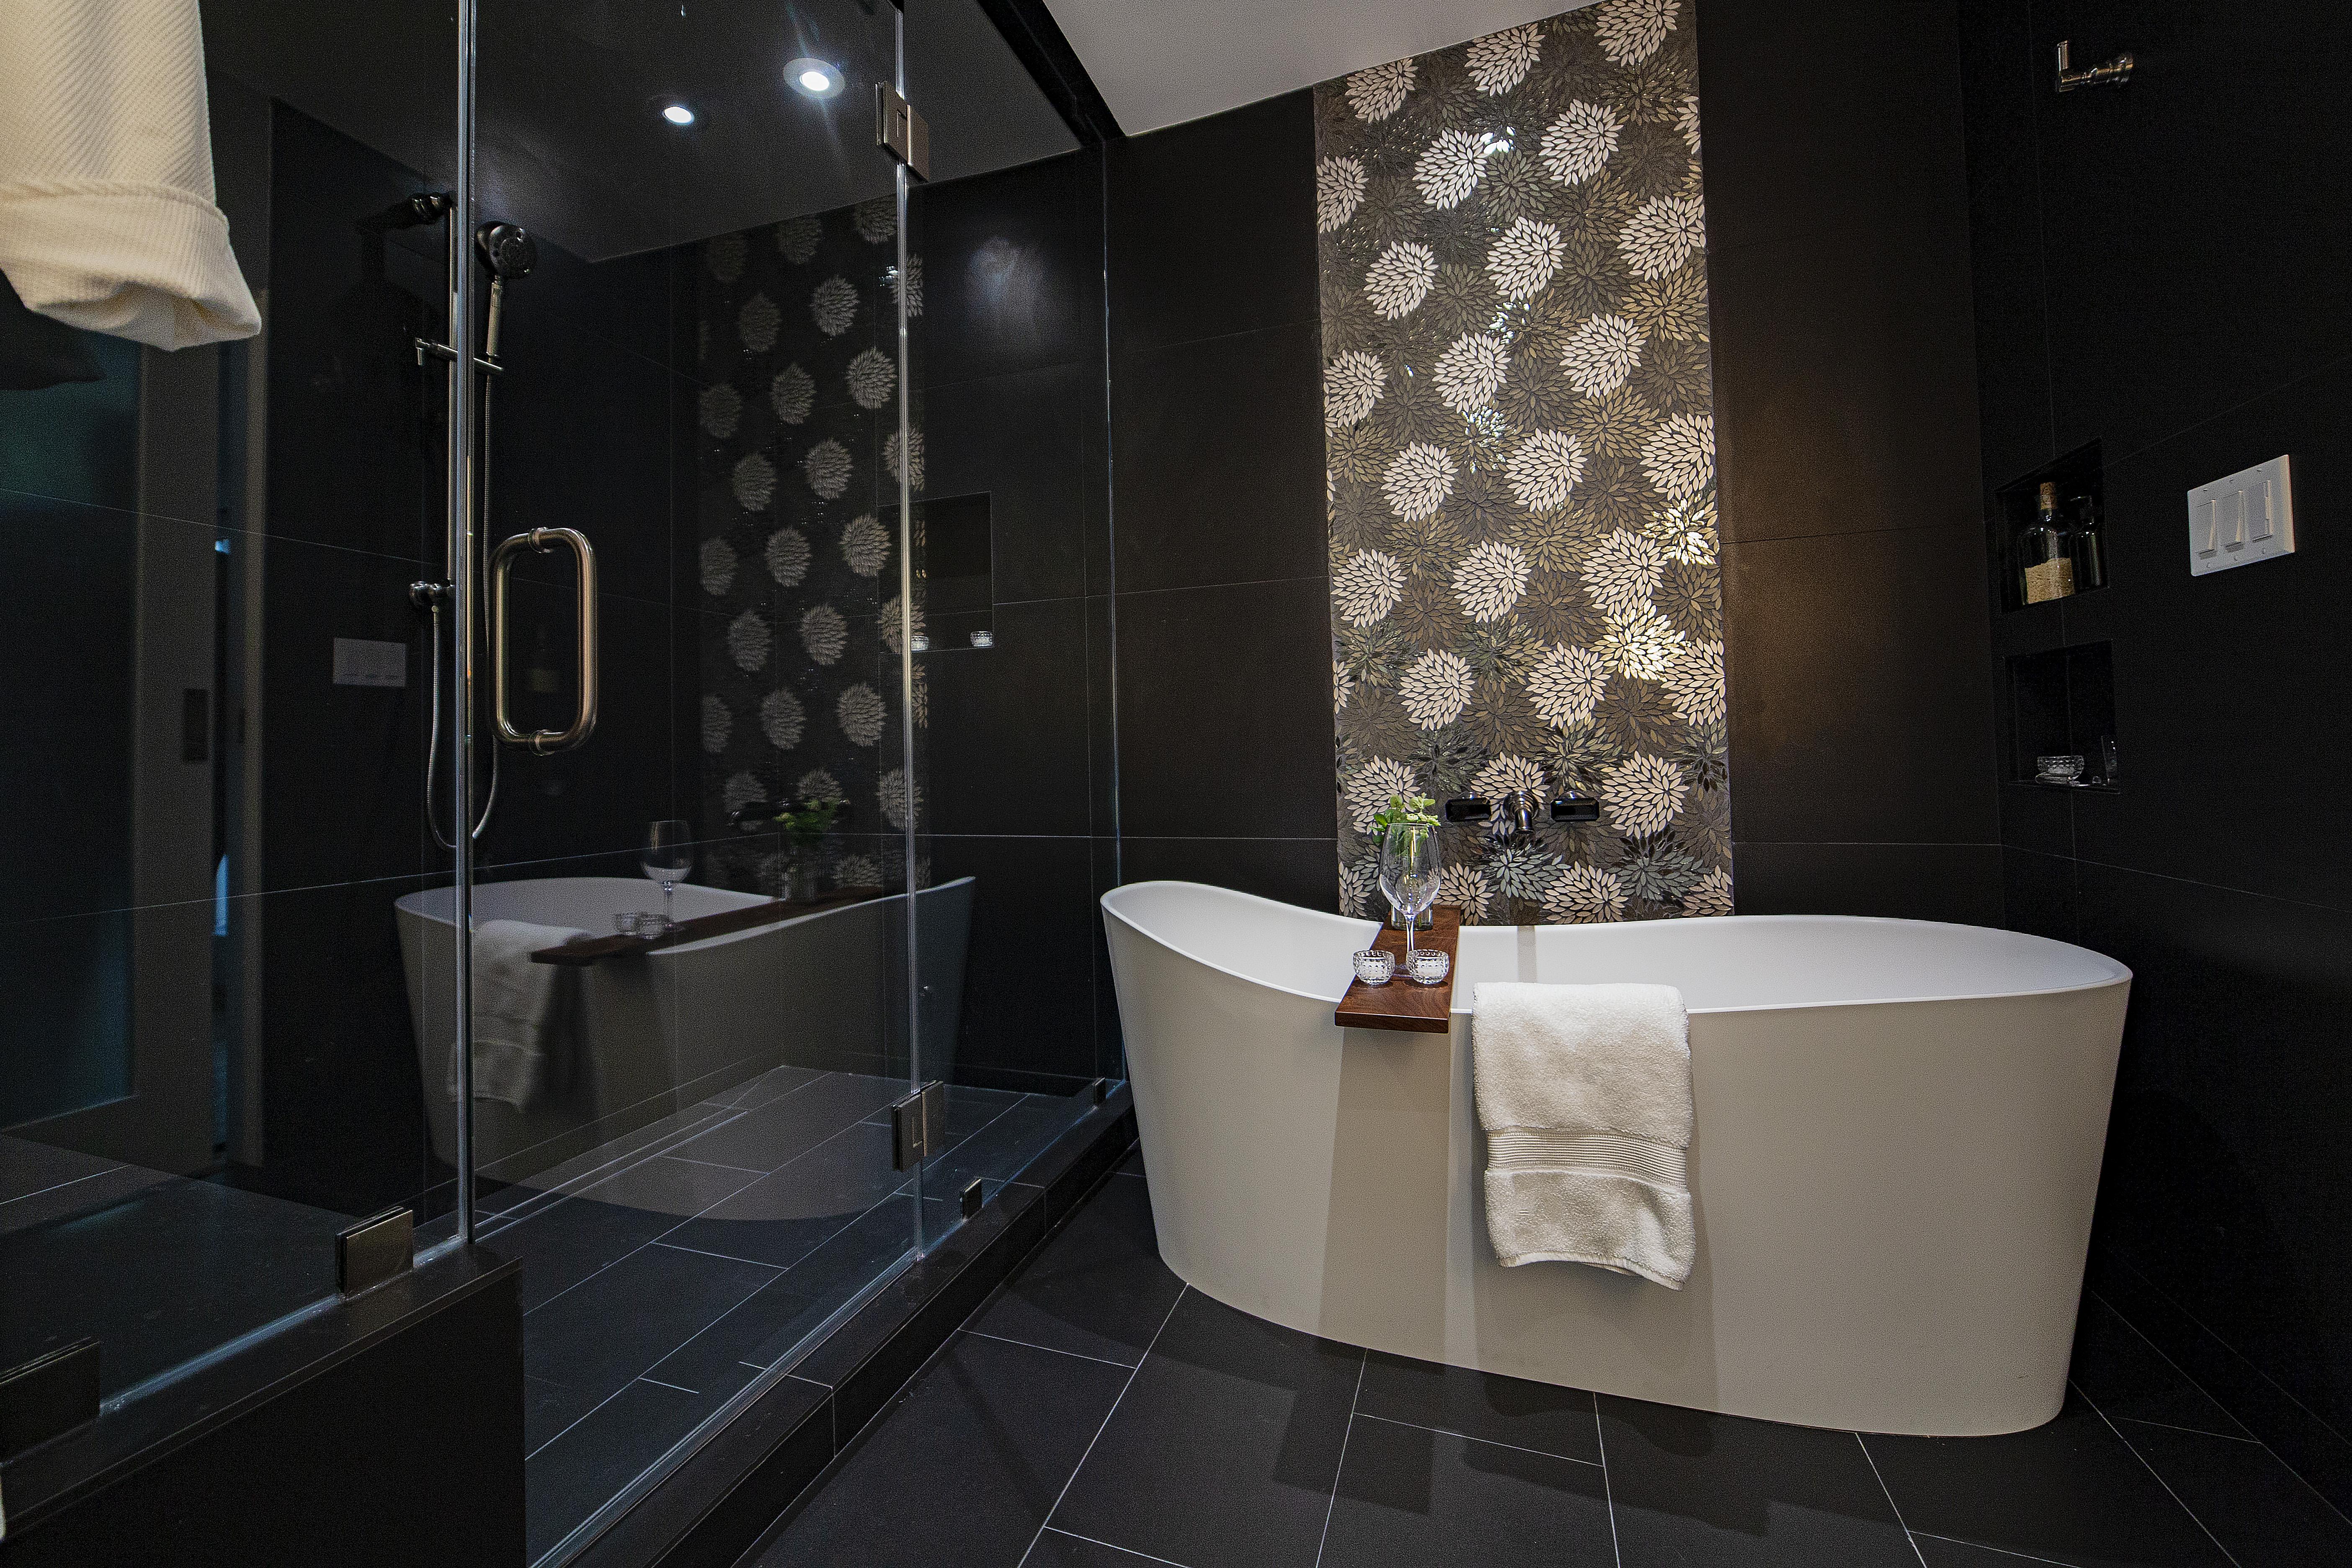 Bathroom & Closet Remodel – Client Testimonial